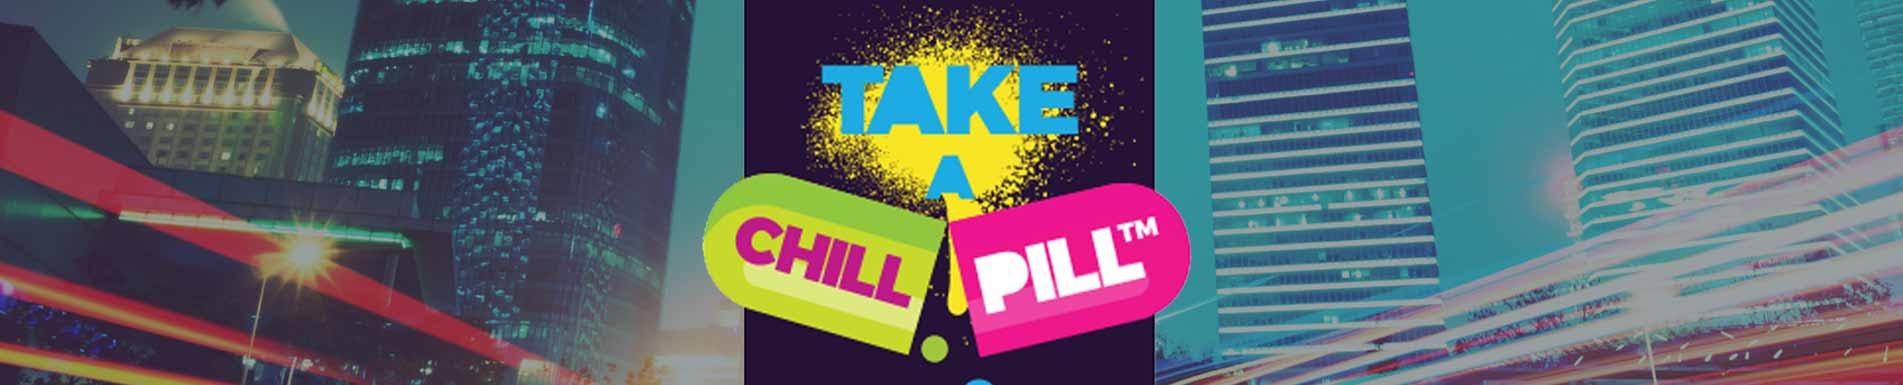 Bannière Chill Pill